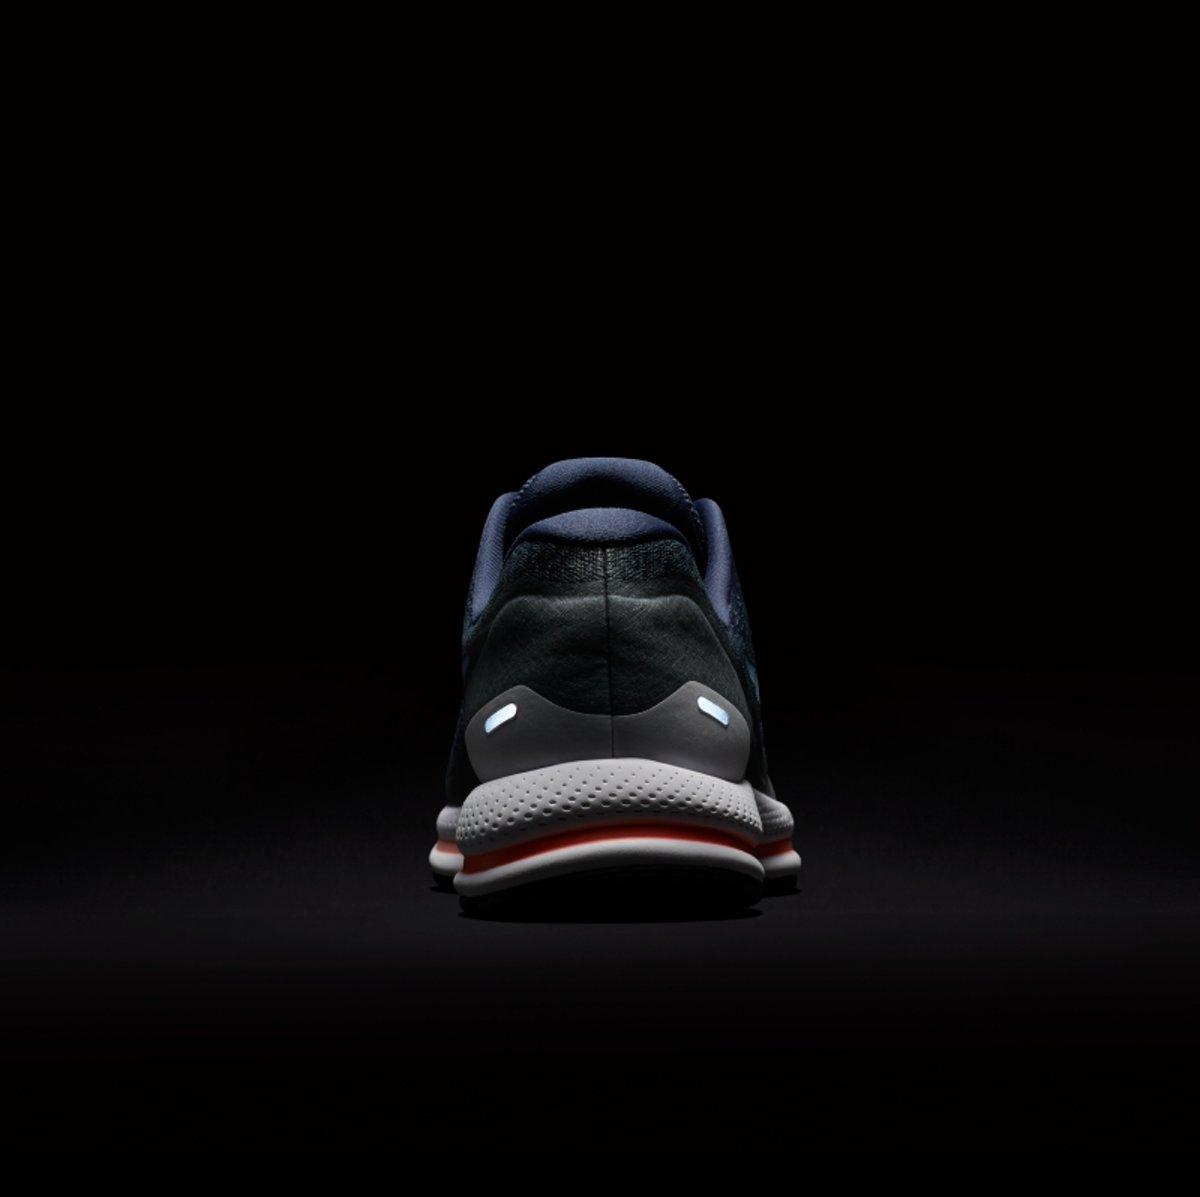 quality design 62ce6 aae73 bol.com  Nike Air Zoom Vomero 13 Hardloopschoenen Heren - Thunder Blue Cirrus Blue-Cool Grey